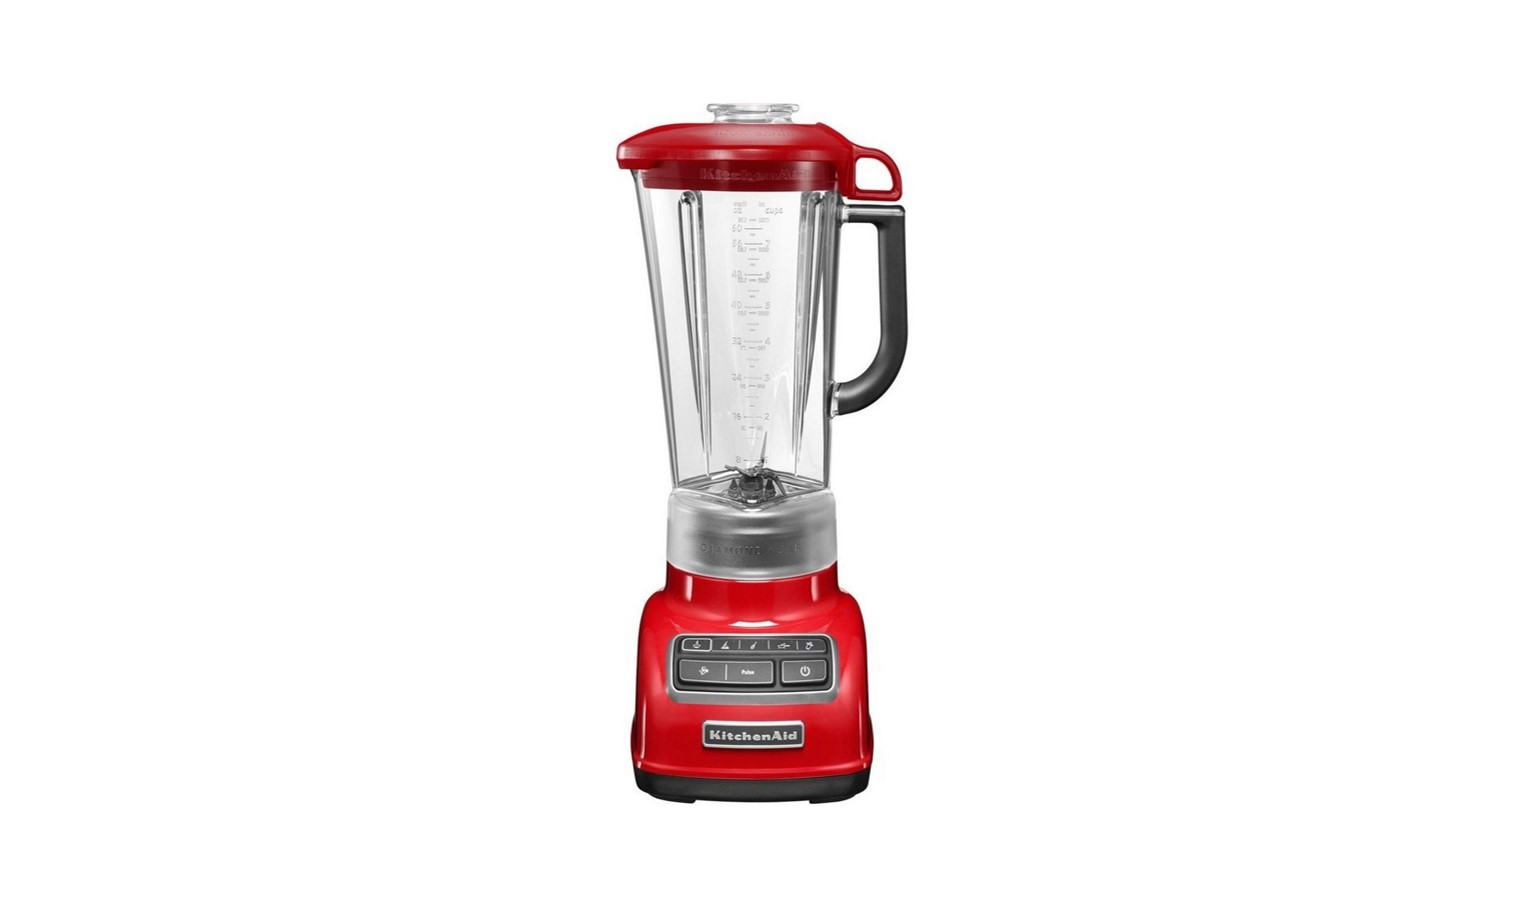 Kitchenaid 5KSB1585 Blender - Empire Red